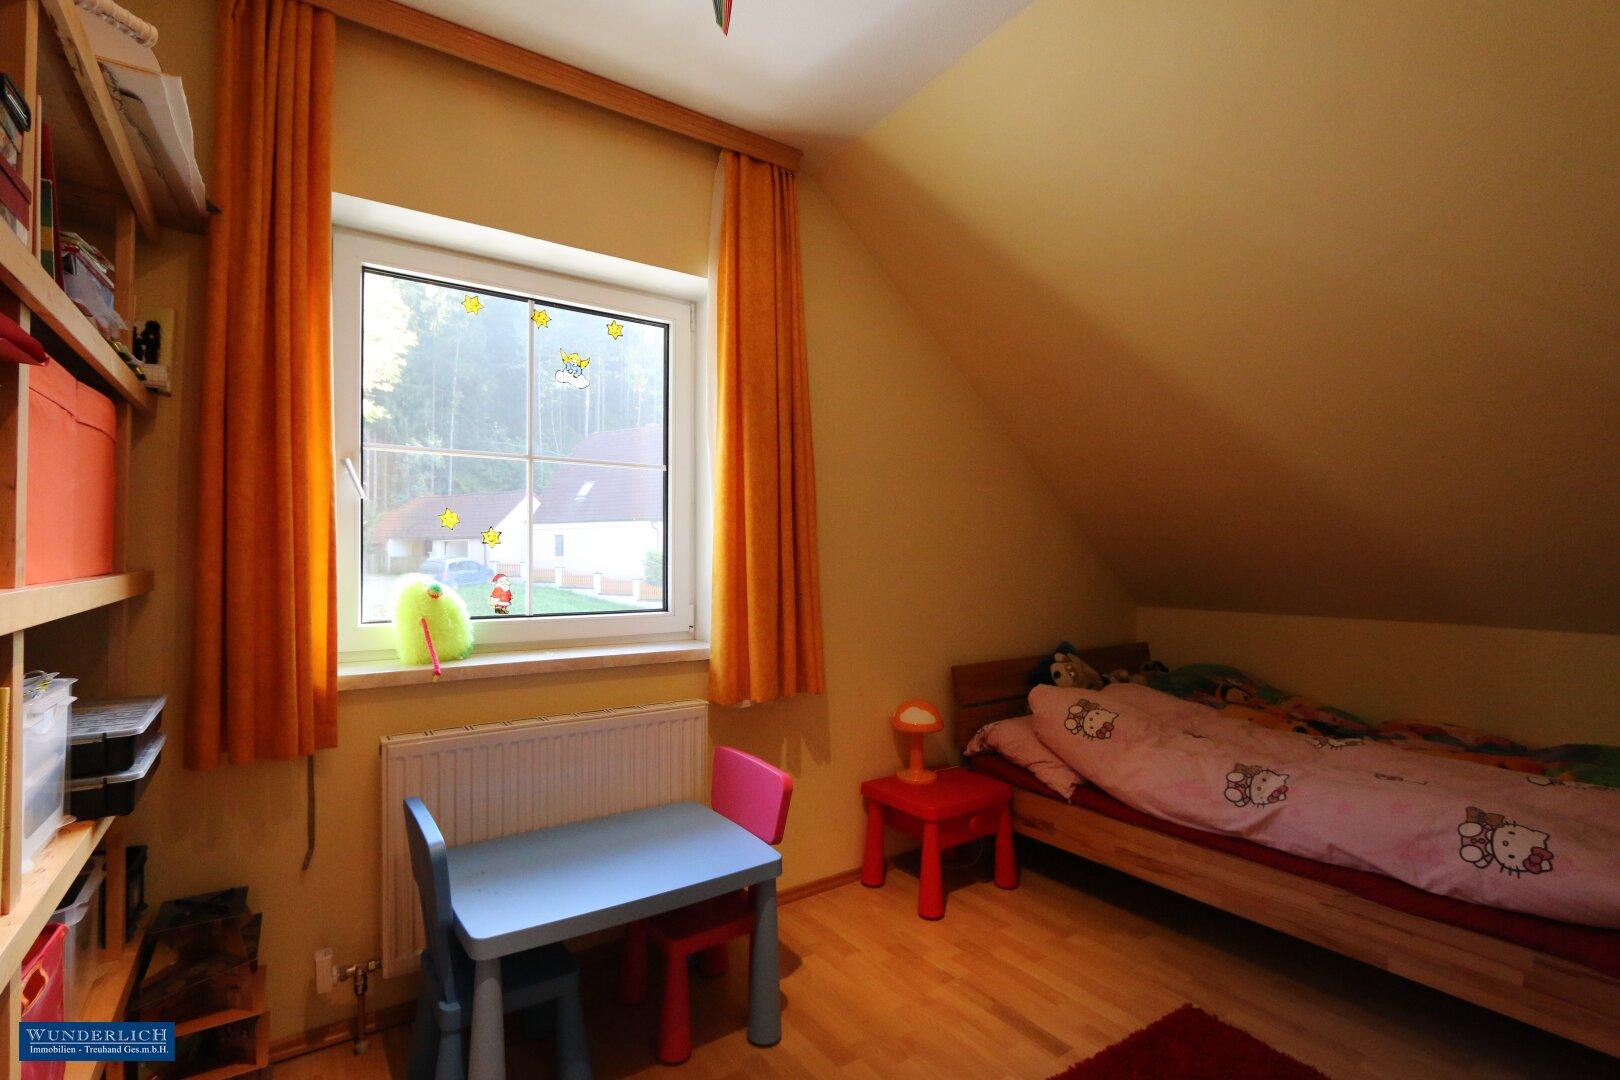 2. Kinderzimmer im Obergeschoß